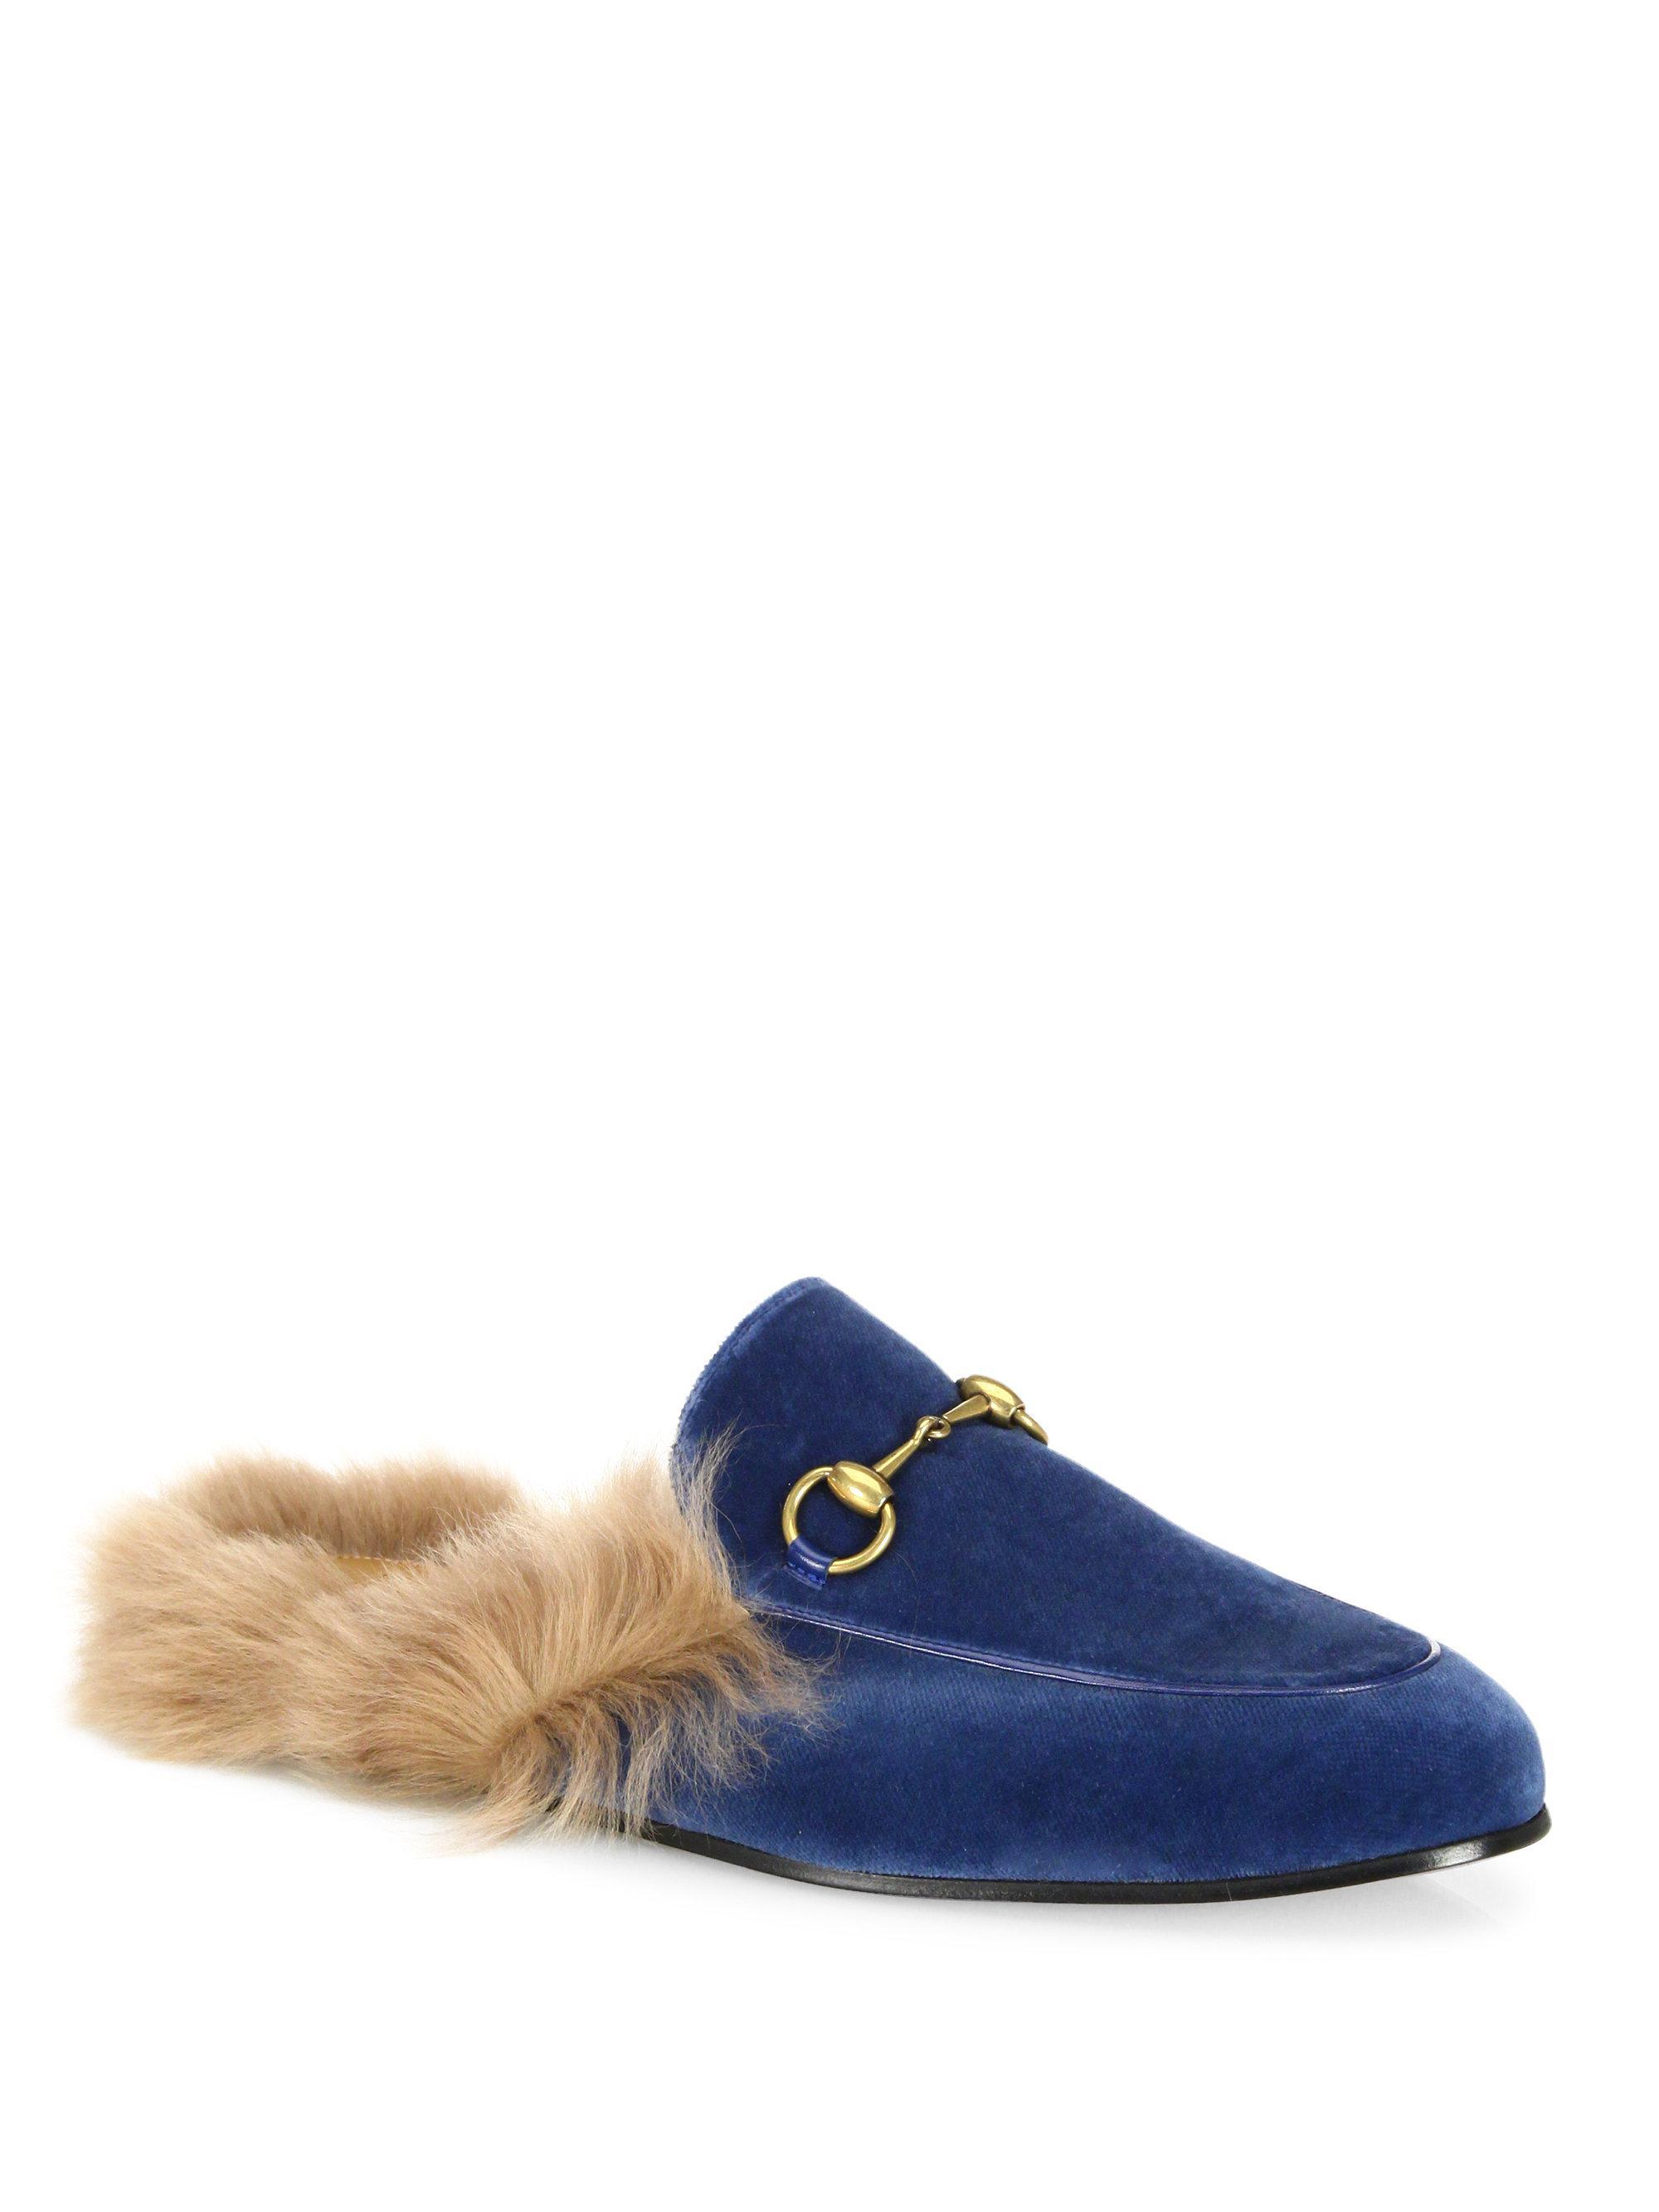 Gucci Blue Velvet & Fur Princetown Slippers MnuPoP6